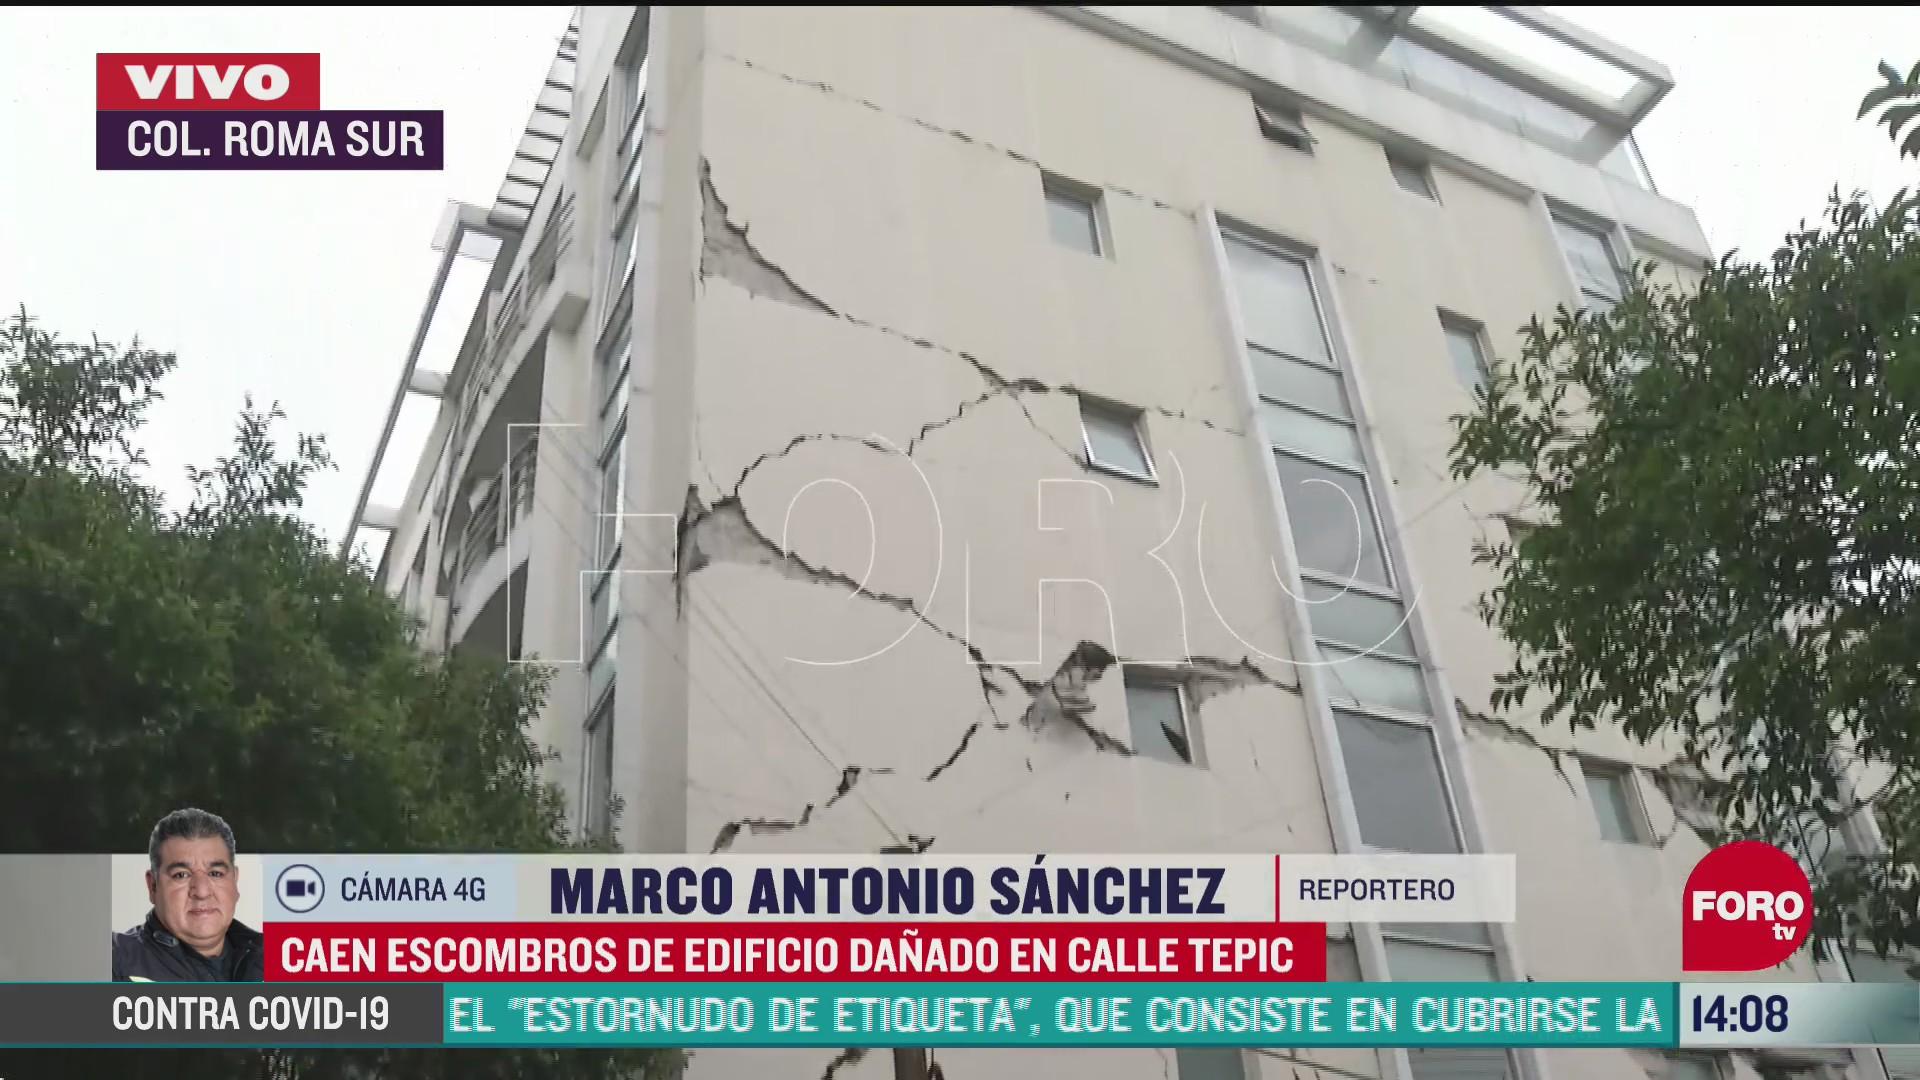 FOTO: caen escombros de edificio danado por sismo en colonia roma